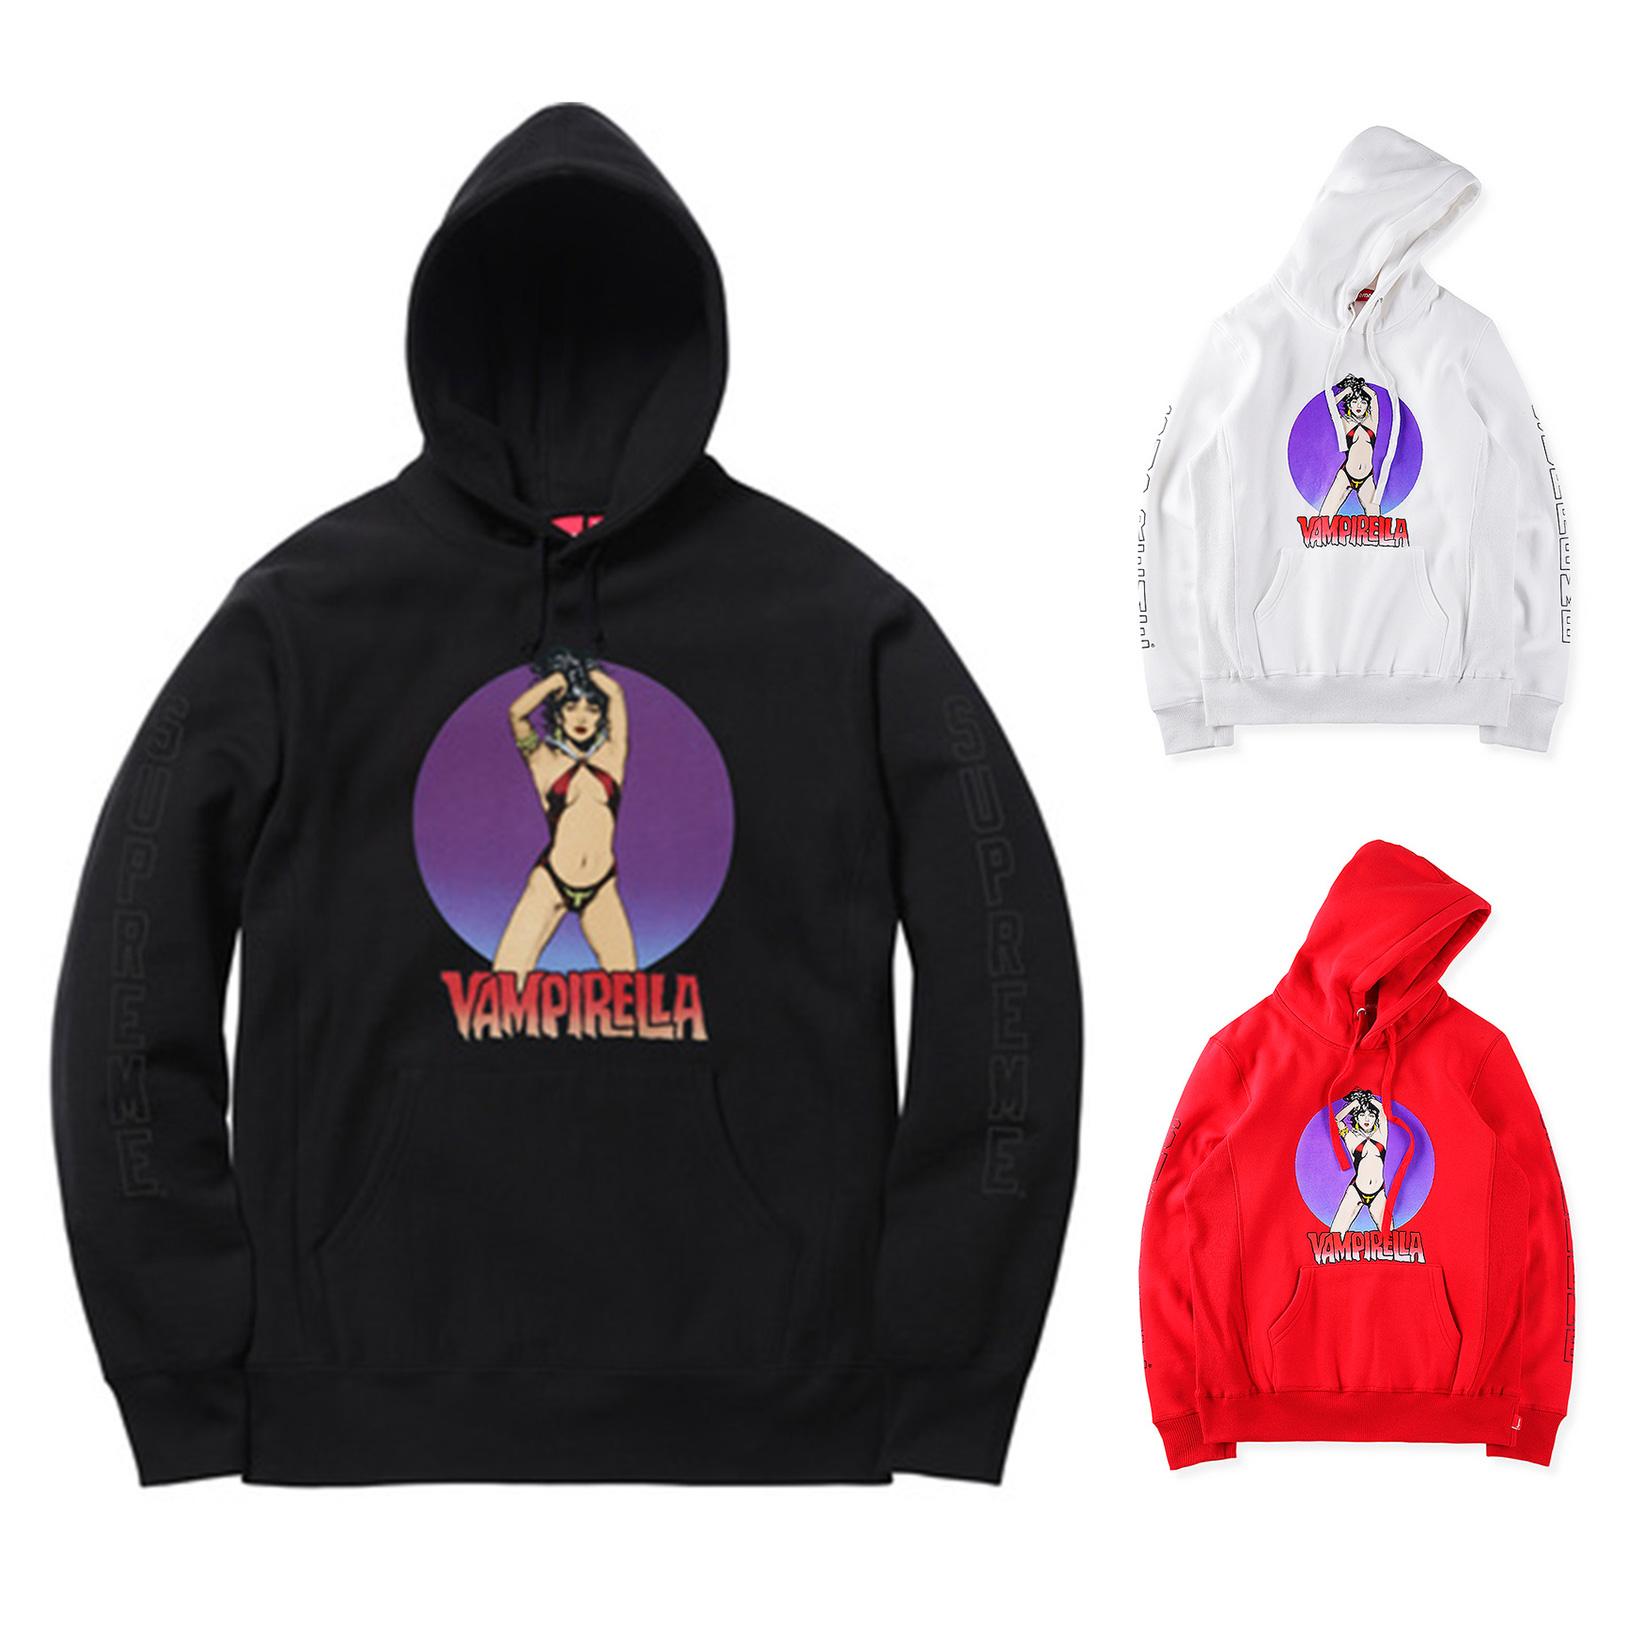 17SS Supreme (シュプリーム) Vampirella Hooded Sweatshirt フーデッド パーカー 3 色